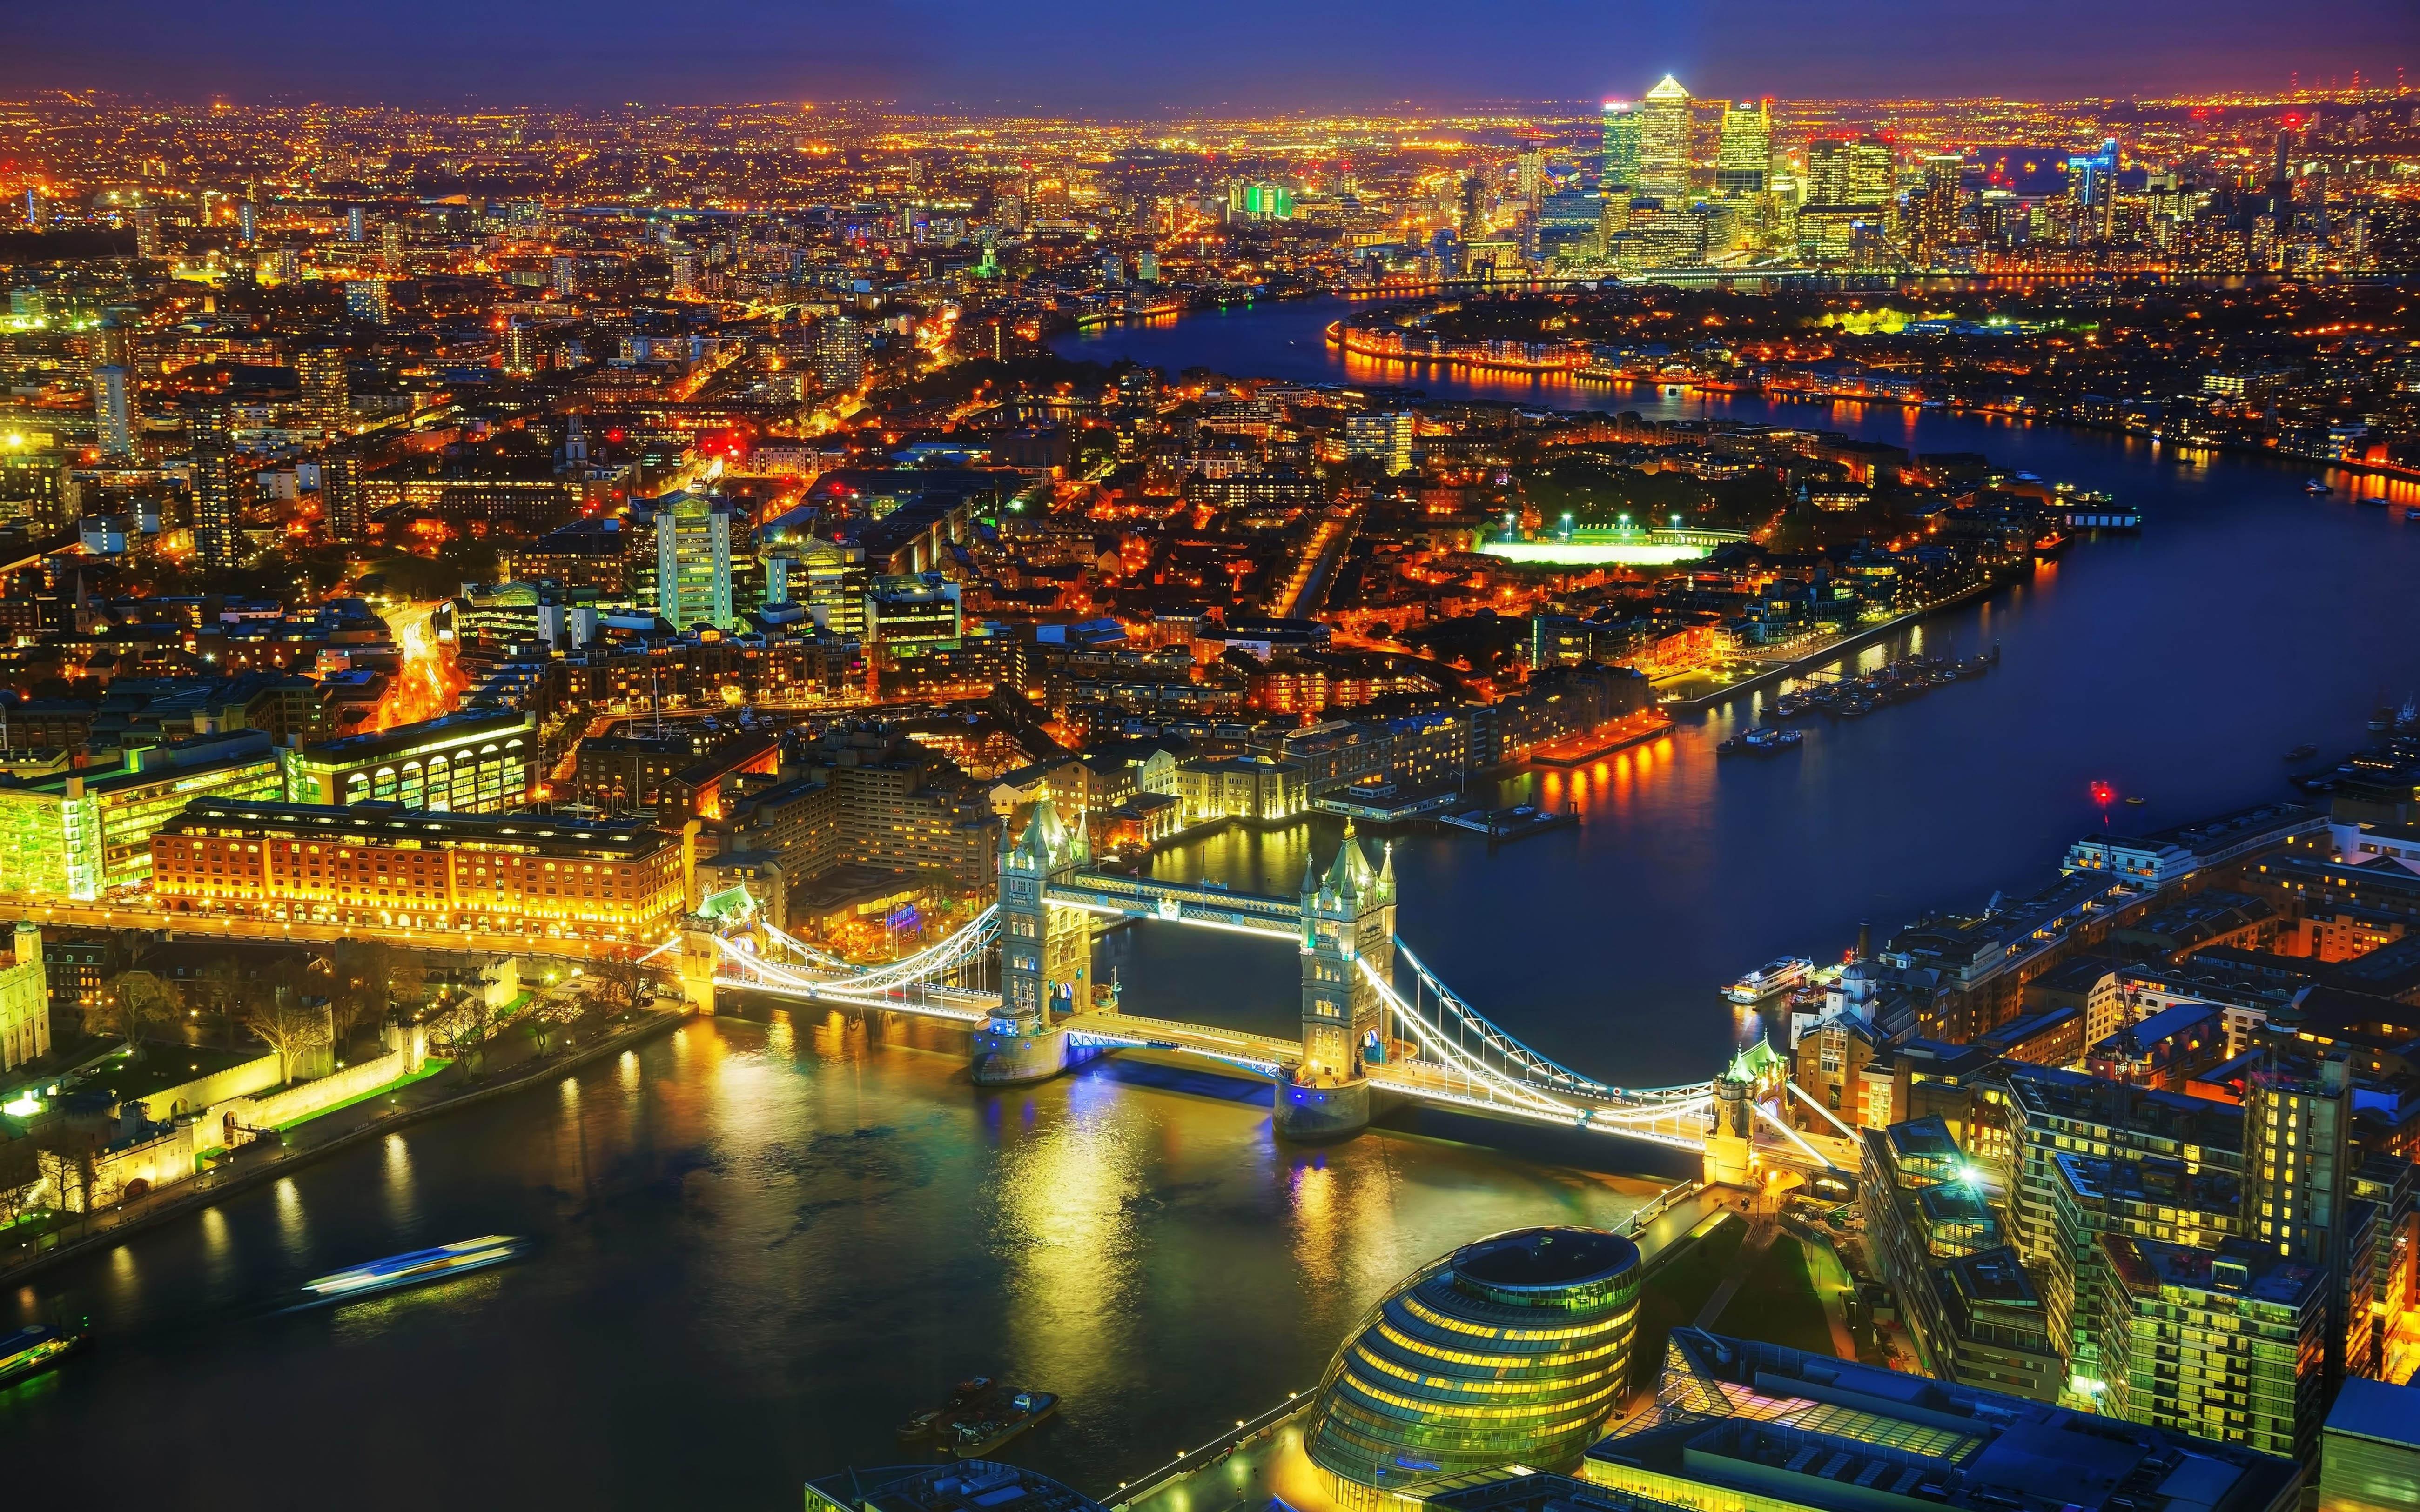 Download Original Resolution - London 4k , HD Wallpaper & Backgrounds